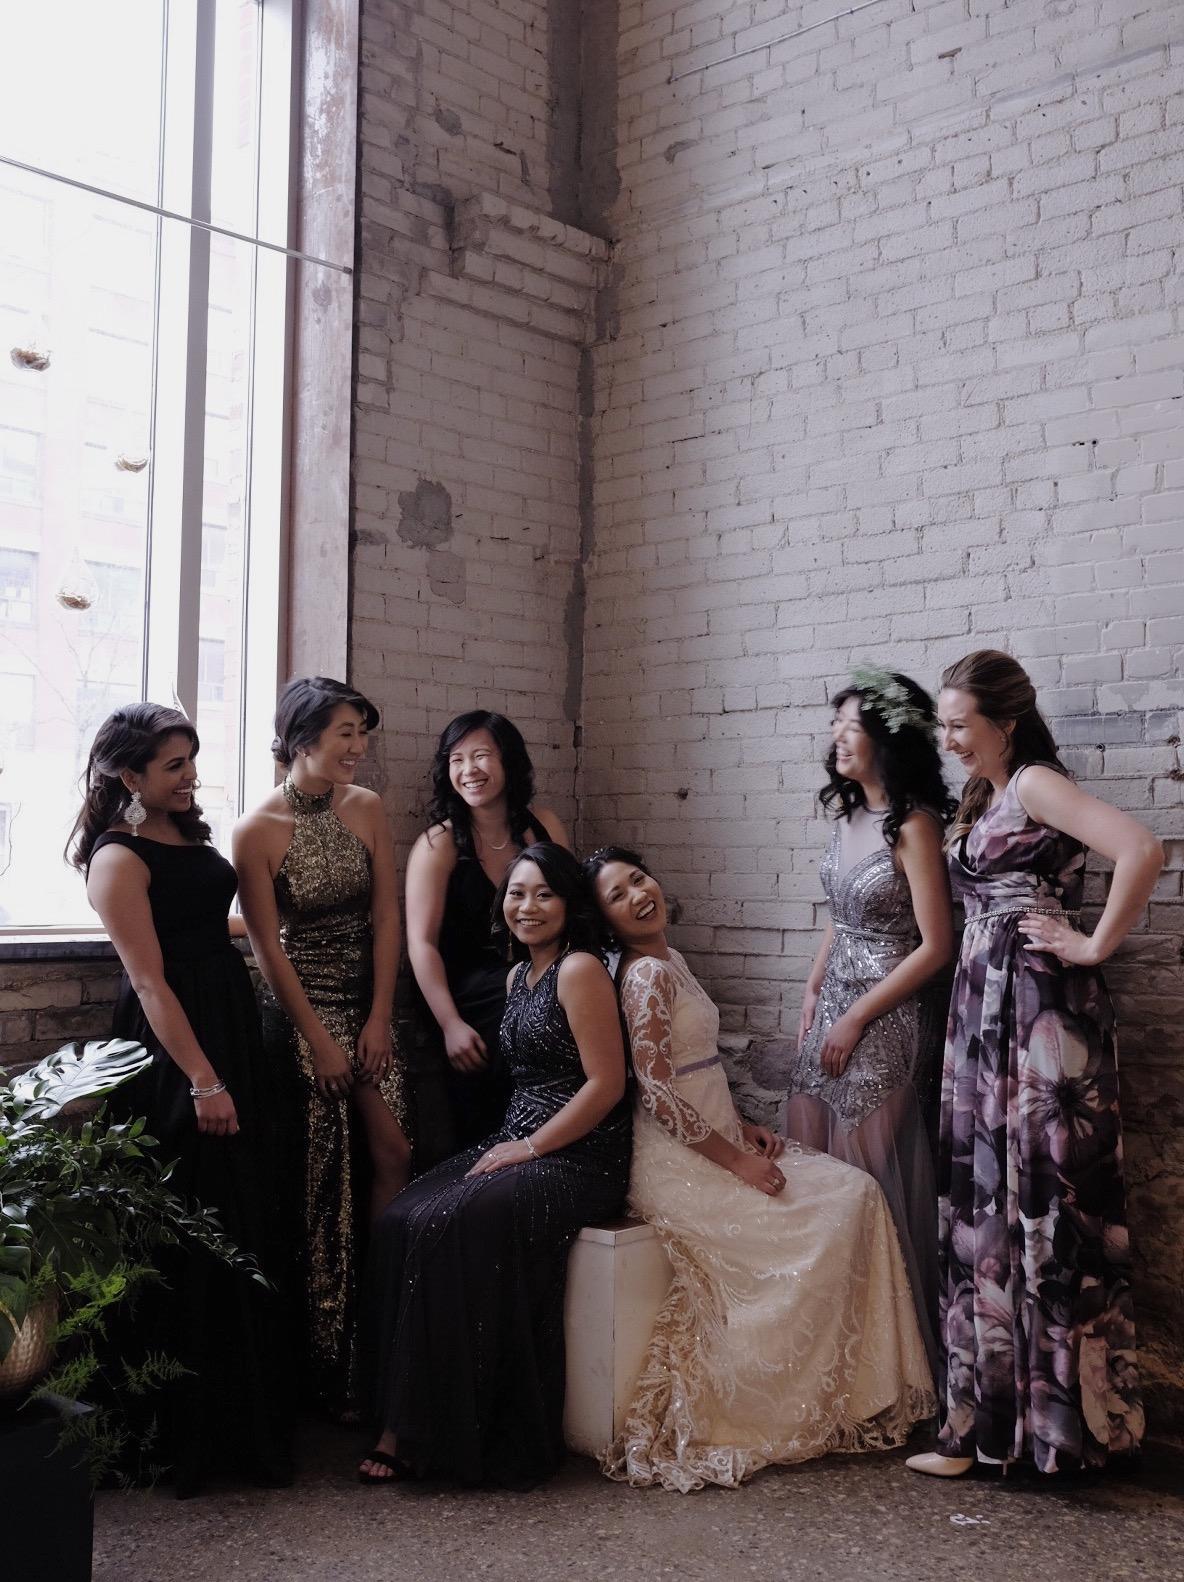 Hae Wedding Photography